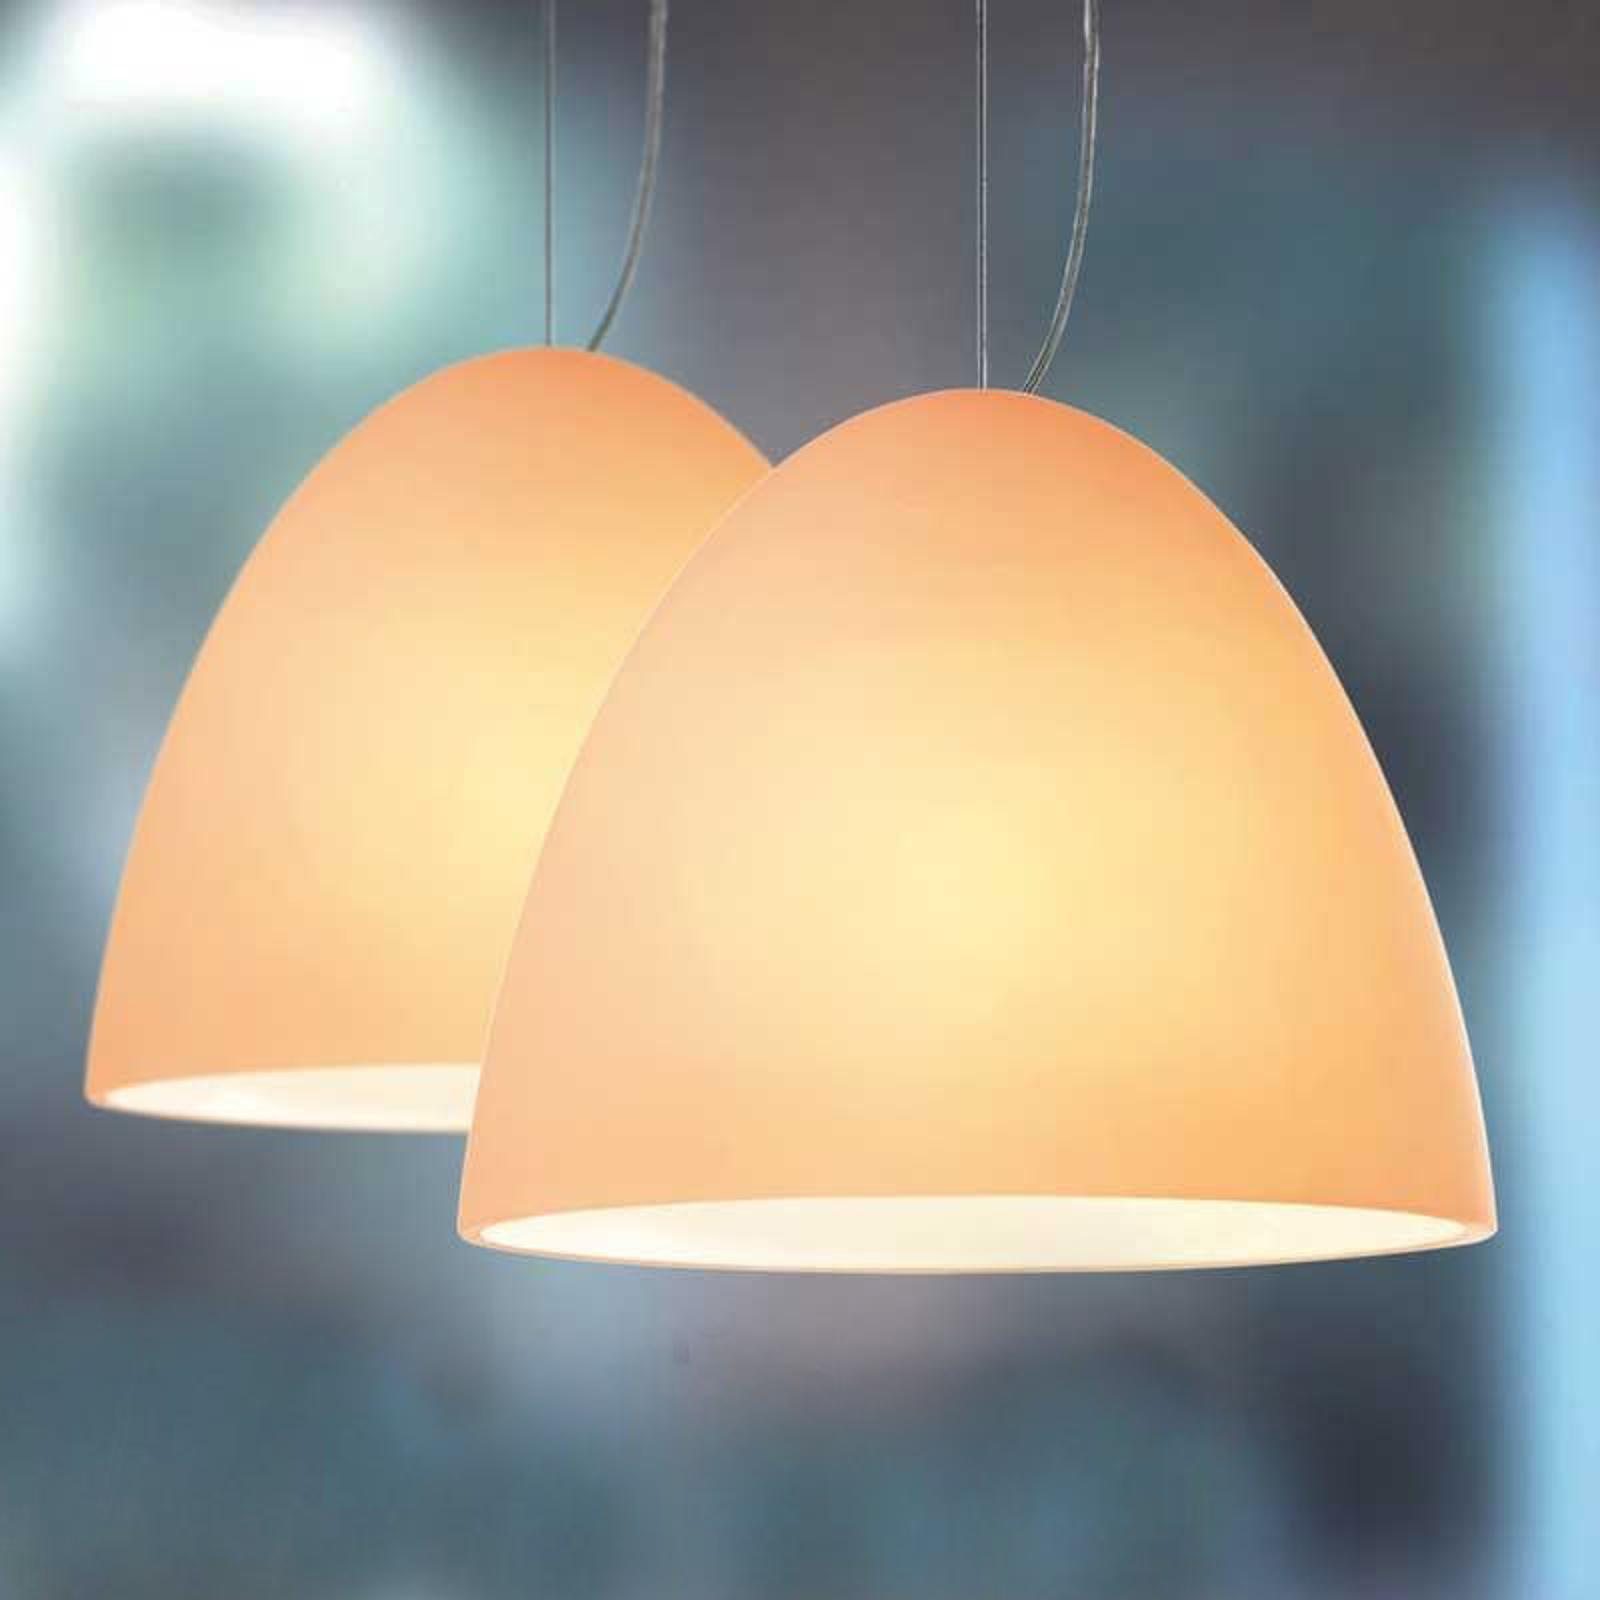 Lampa wisząca BELL 2-punktowa 30 cm piaskowa